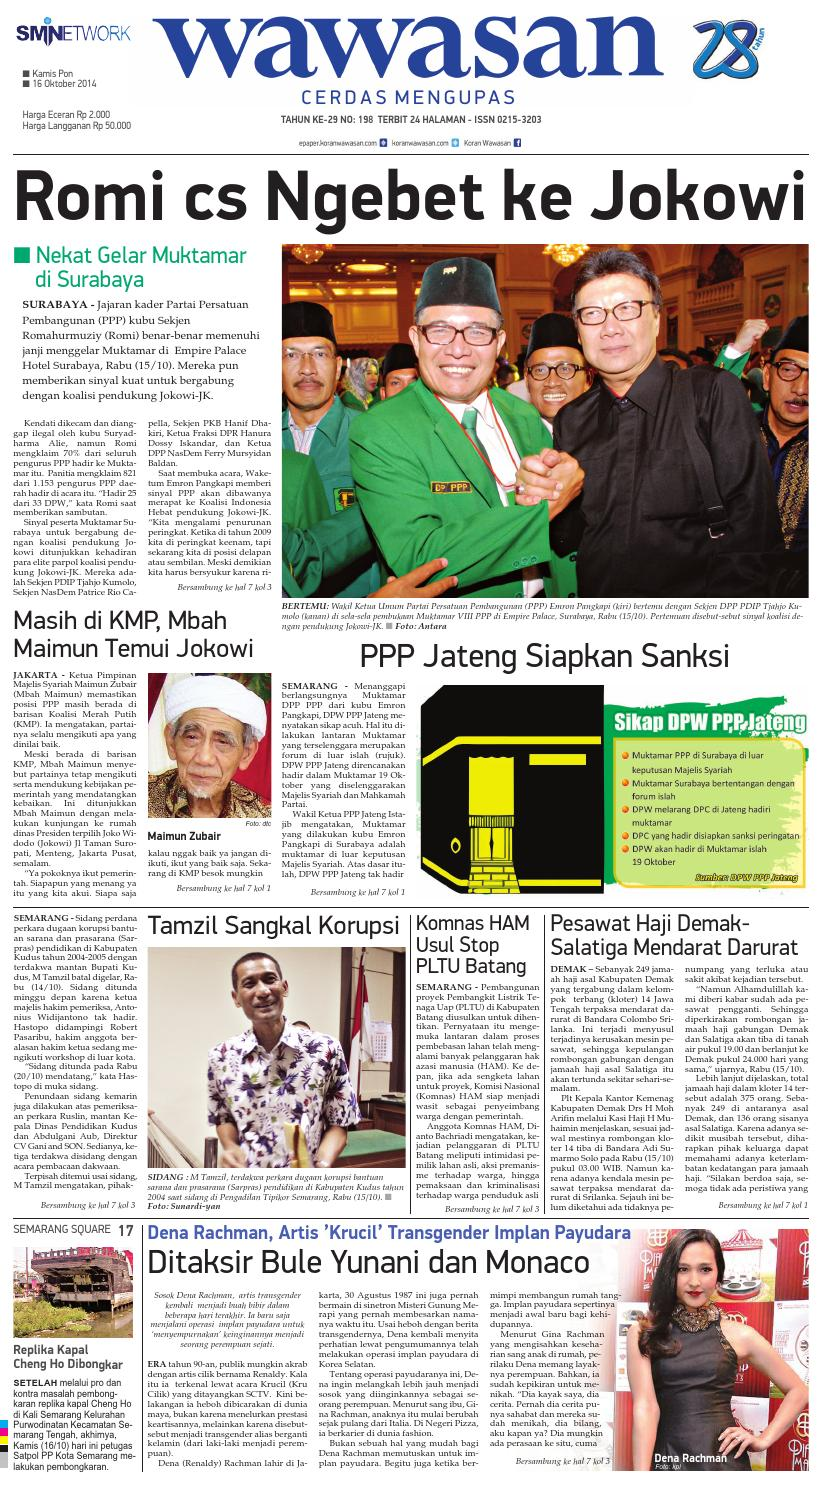 Wawasan 16 Oktober 2014 By Koran Pagi Issuu Produk Ukm Bumn Barbekyu Kelitik Surabaya